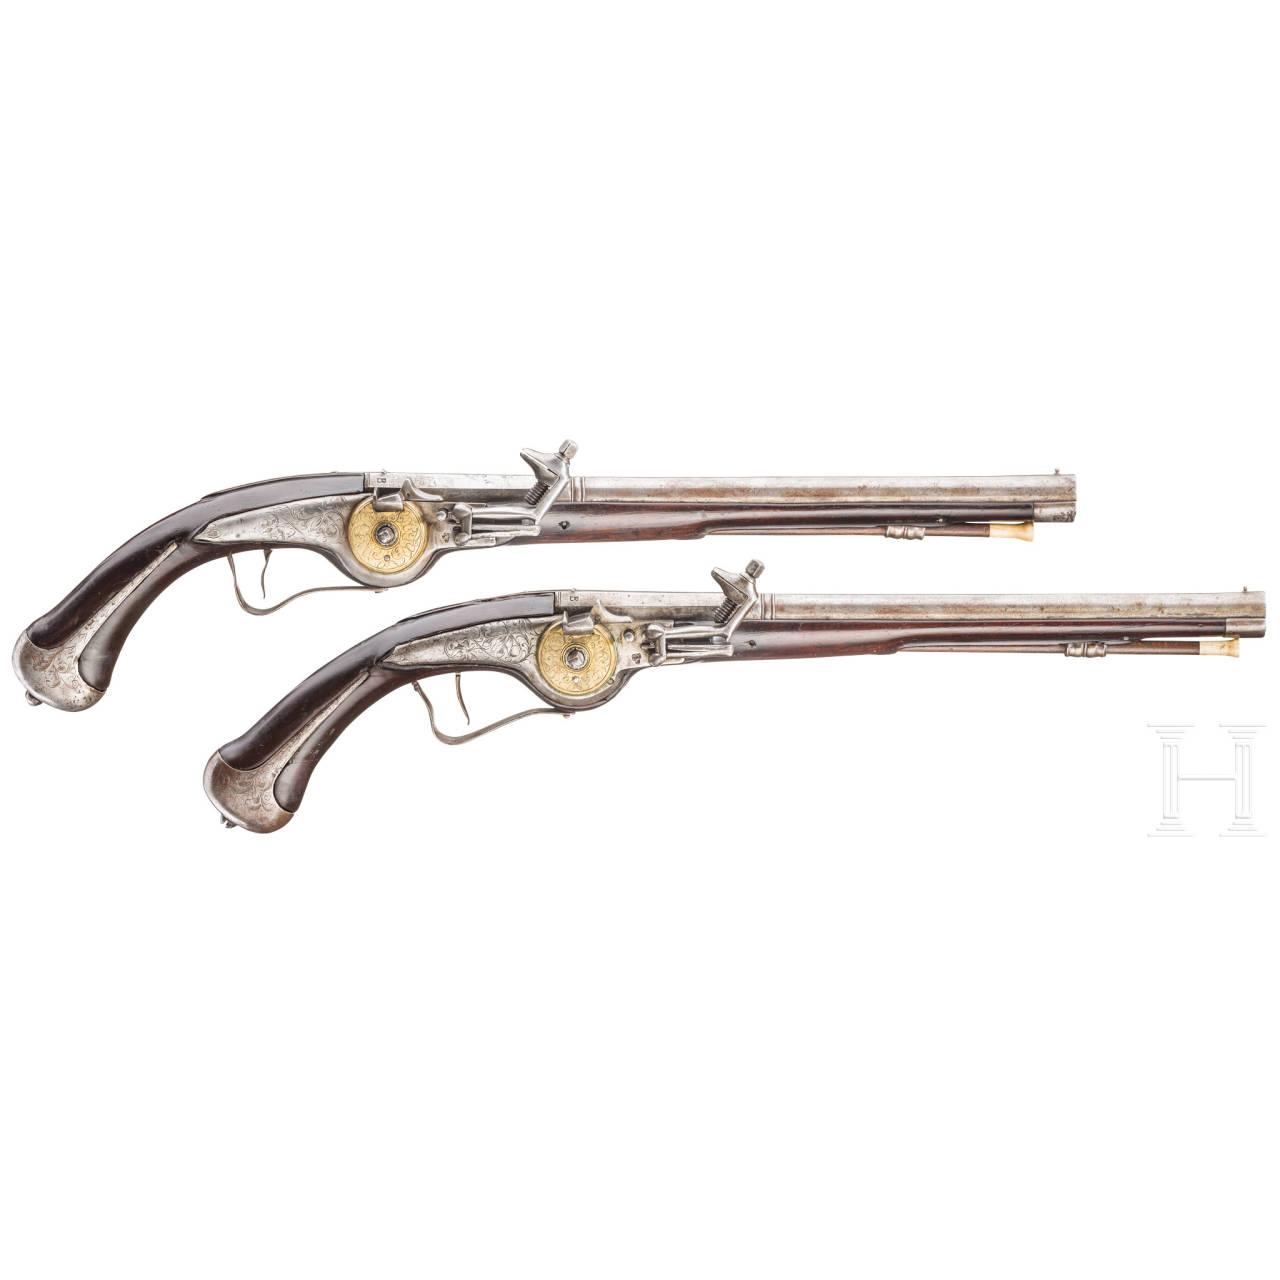 A pair of officer's wheellock pistols, Suhl, circa 1650